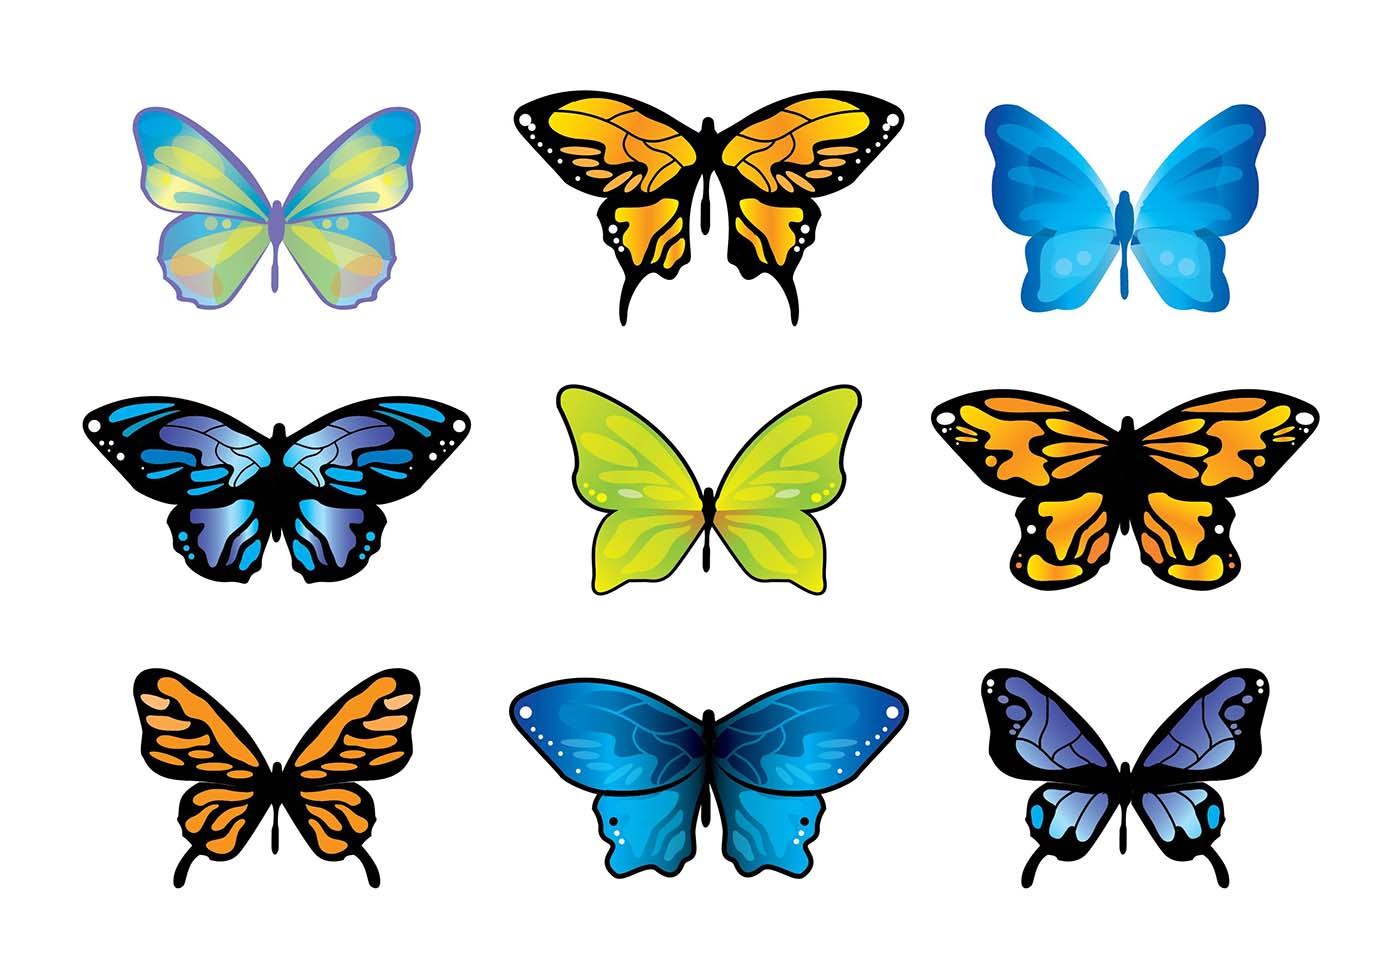 mariposa butterfly vector set download free vector art